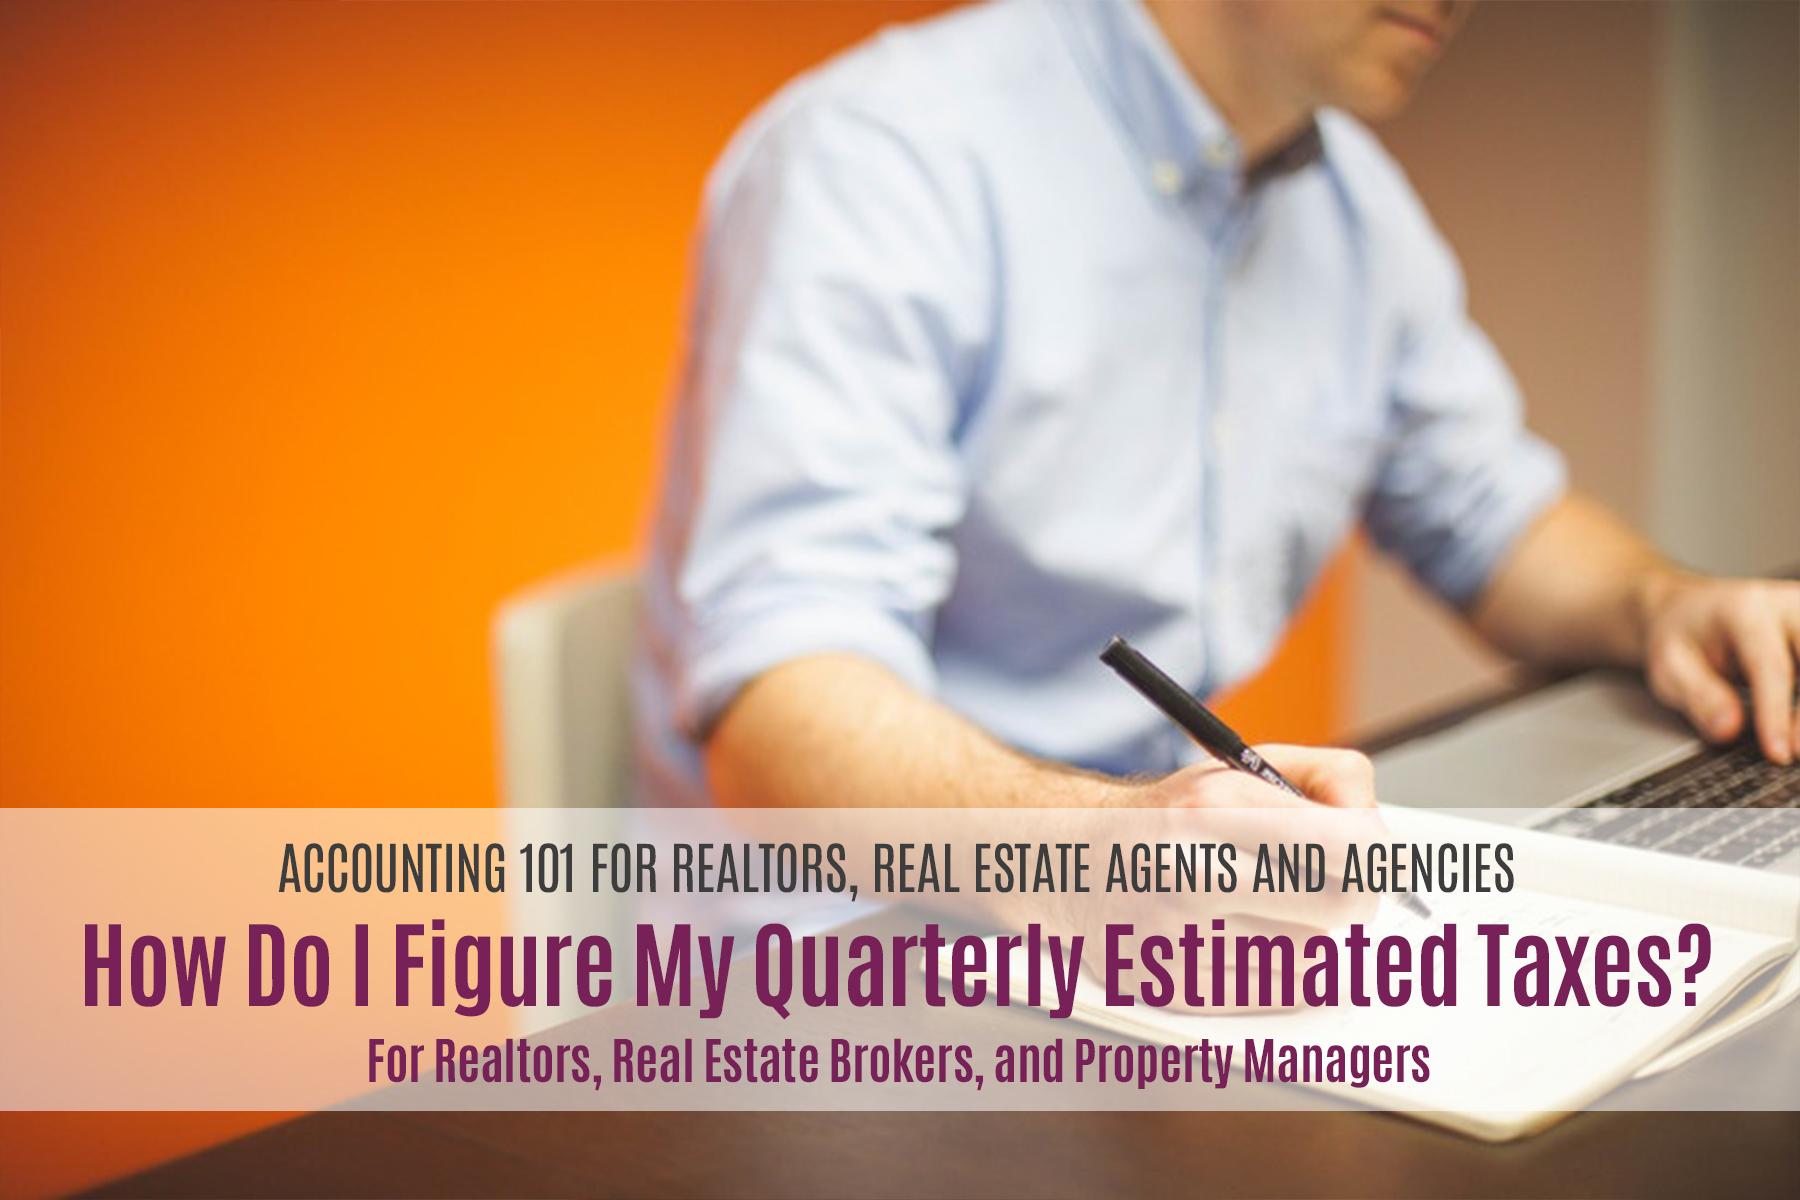 how do i figure my quarterly estimated taxes  for realtors